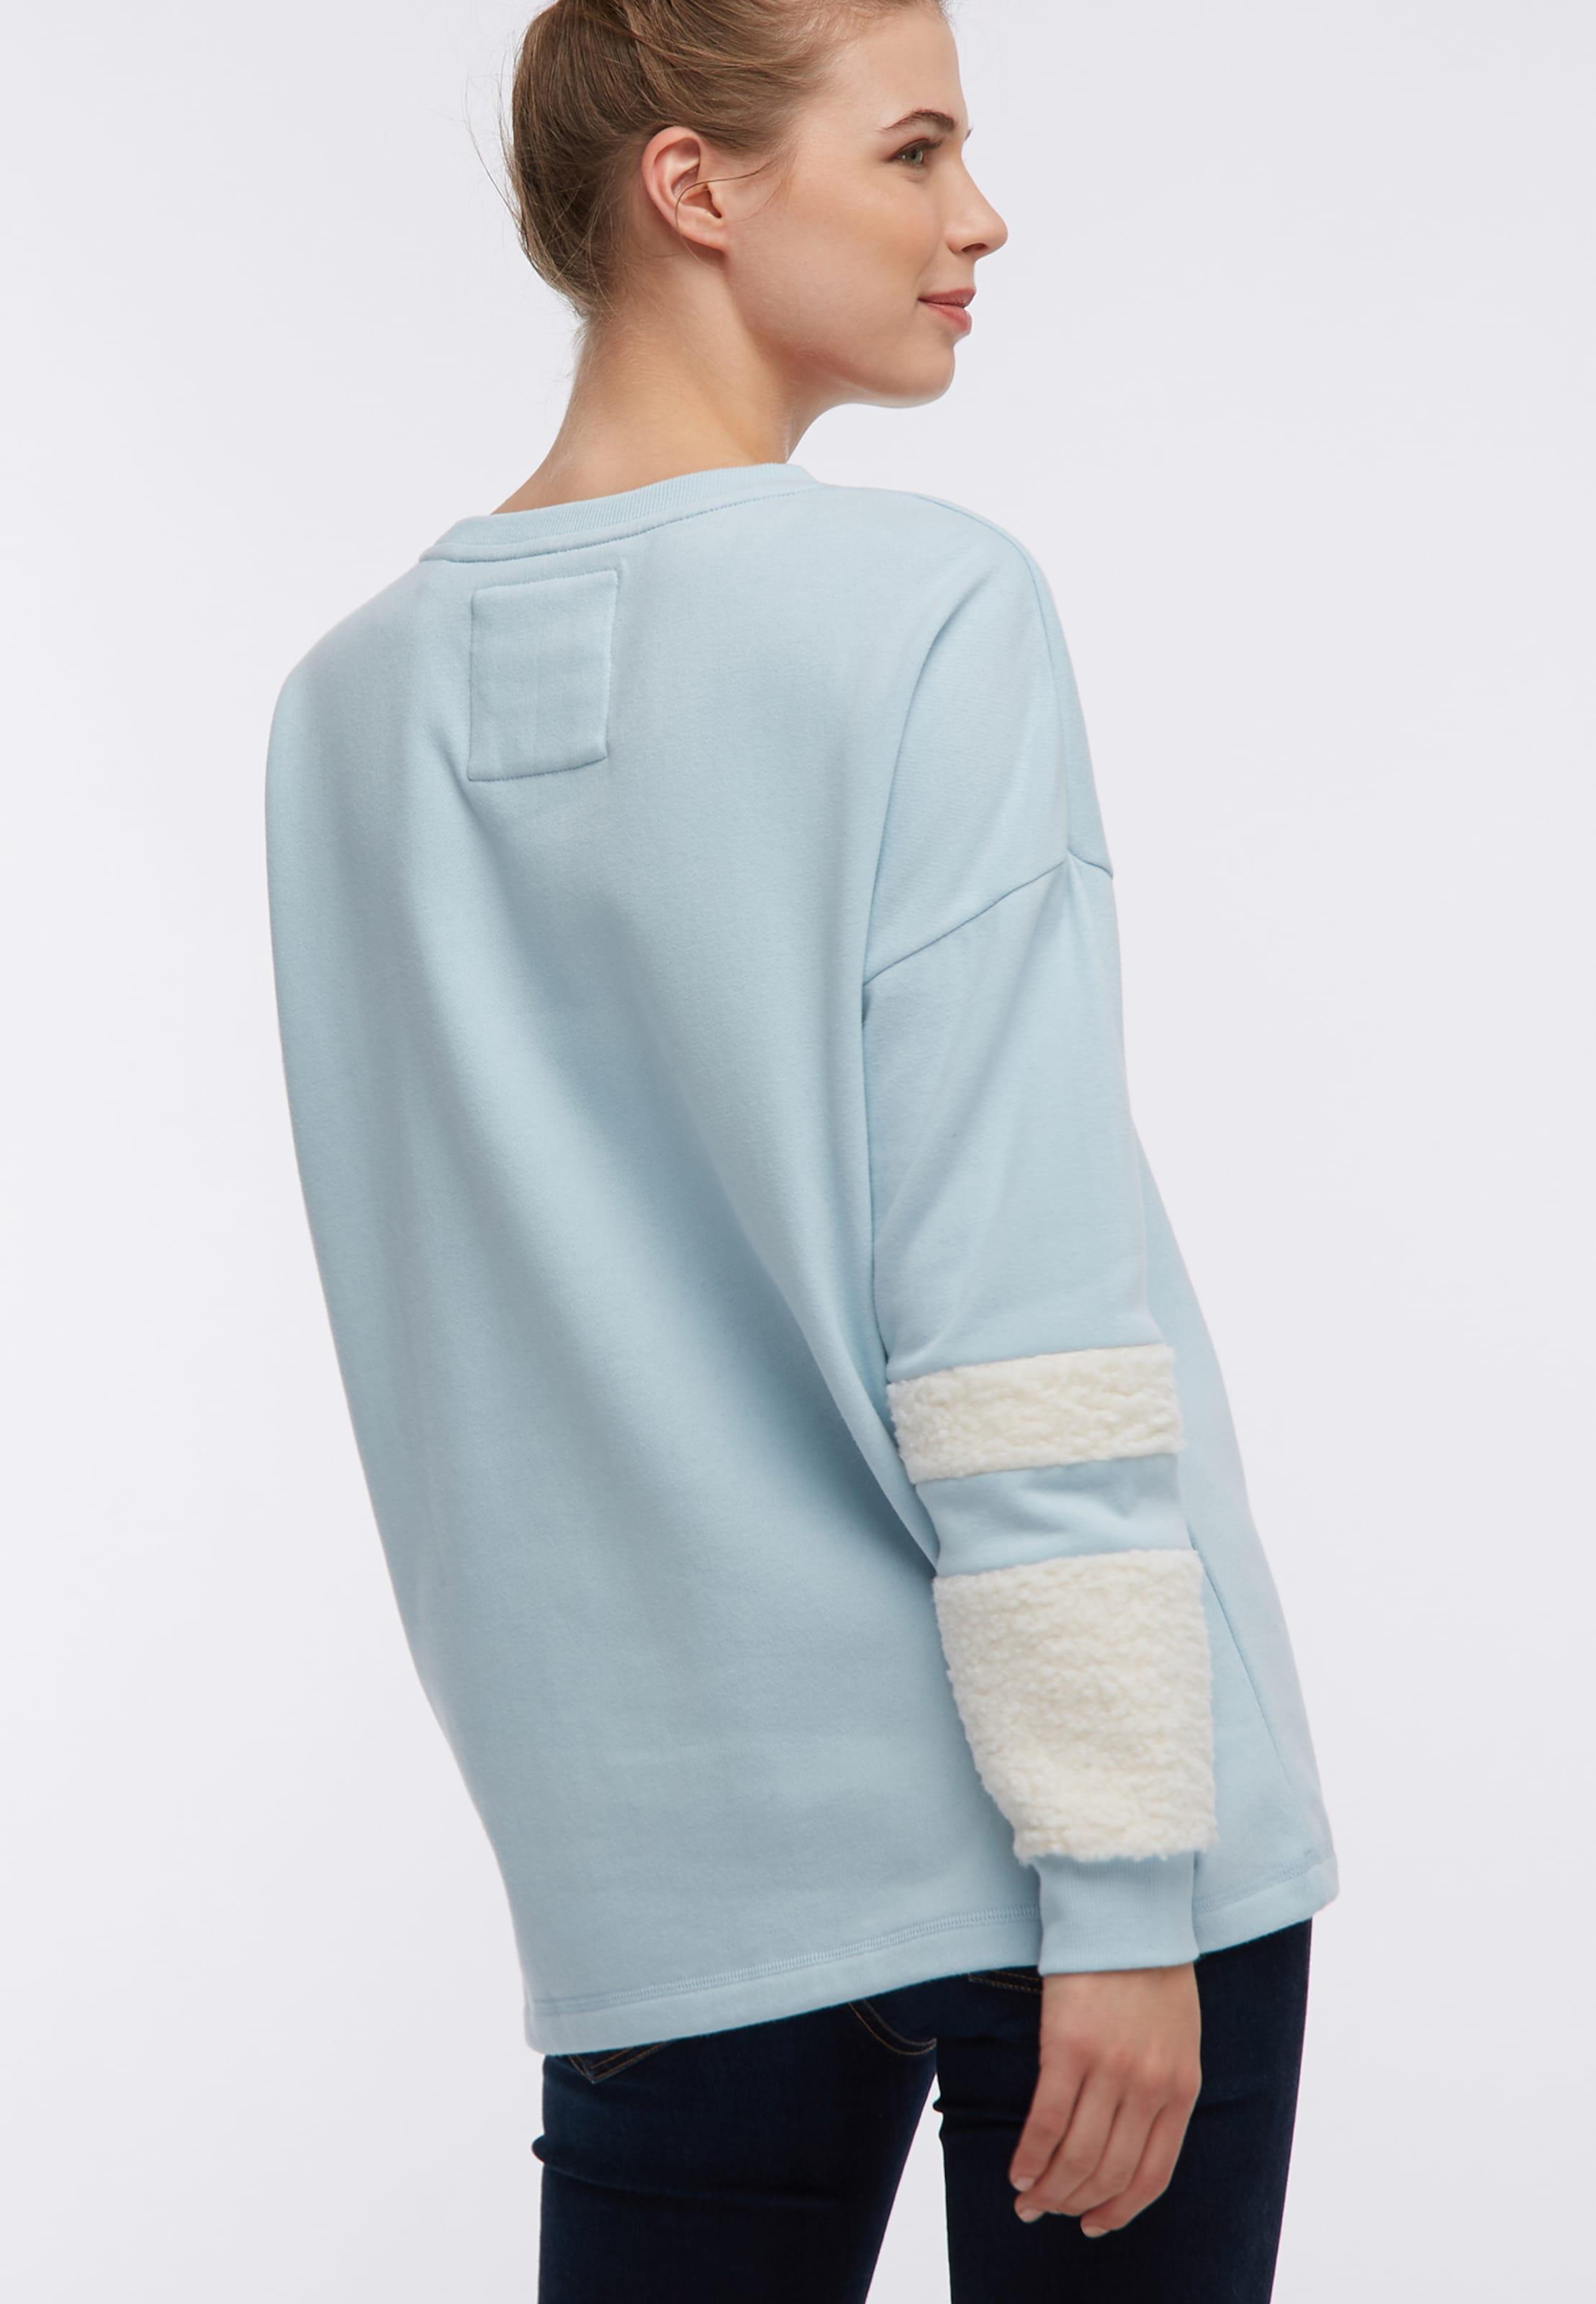 Sweat shirt En Dreimaster Bleu ClairBlanc OP8w0nk